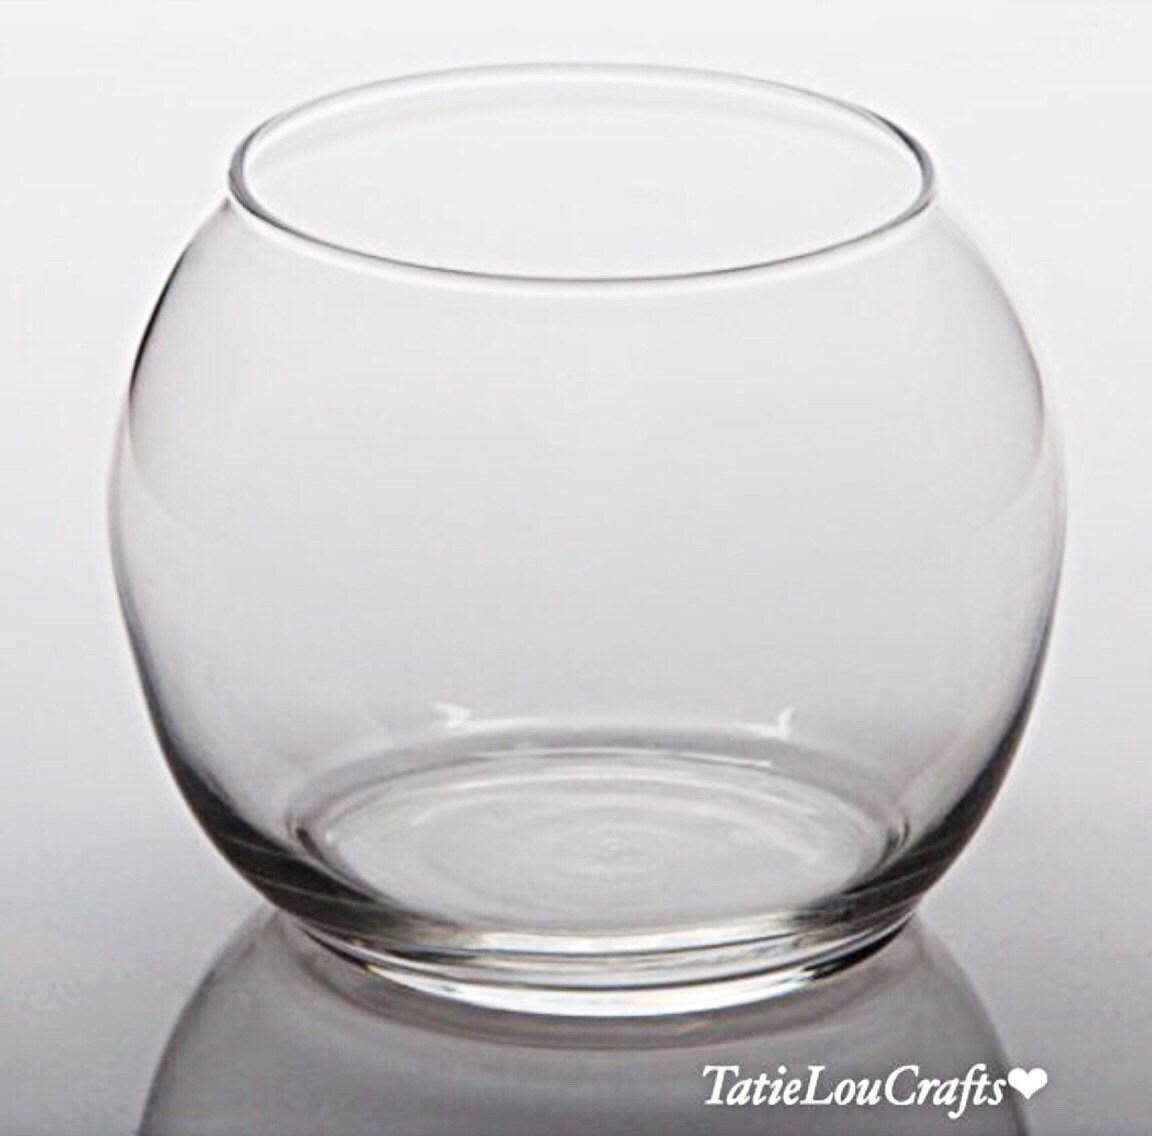 Glass bubble ball vase 8 inch fish bowl terrariumplanter for Bubbles in fish bowl